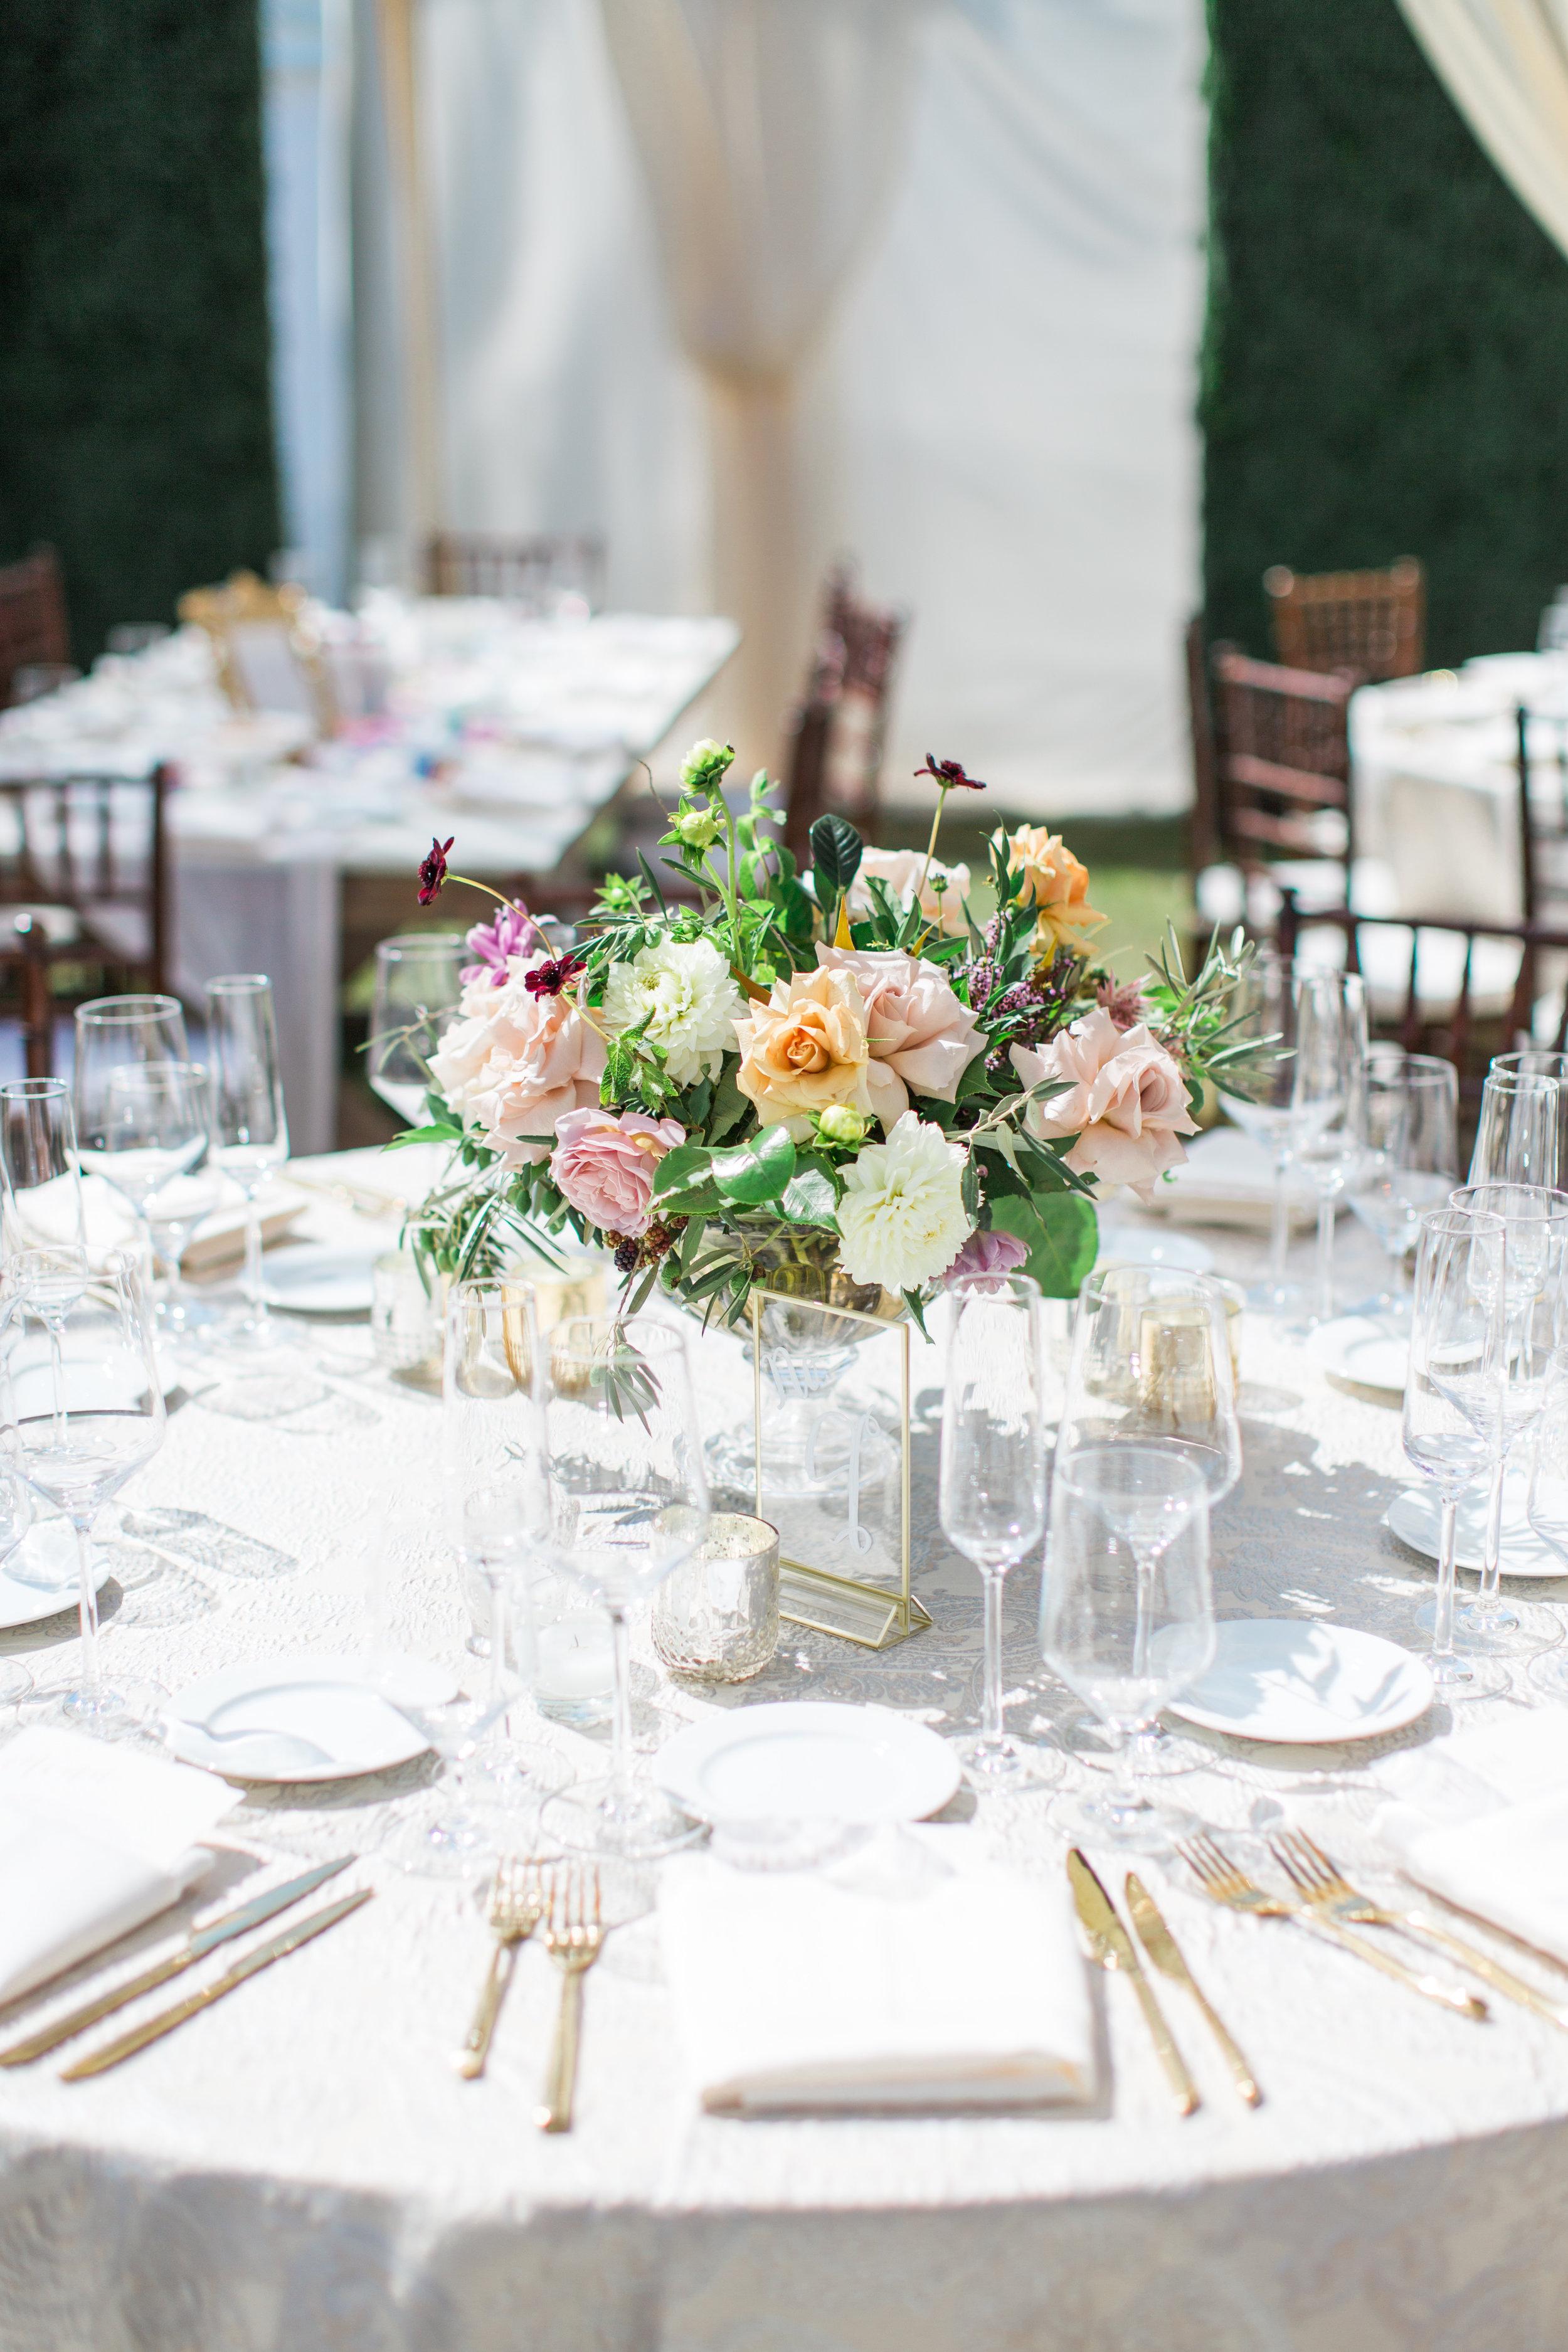 Blooms-breesa-lee-luxury-florist-aga-jones-tres-chic-affairs-san-diego-wedding-classic-coast-catering-(12).jpg